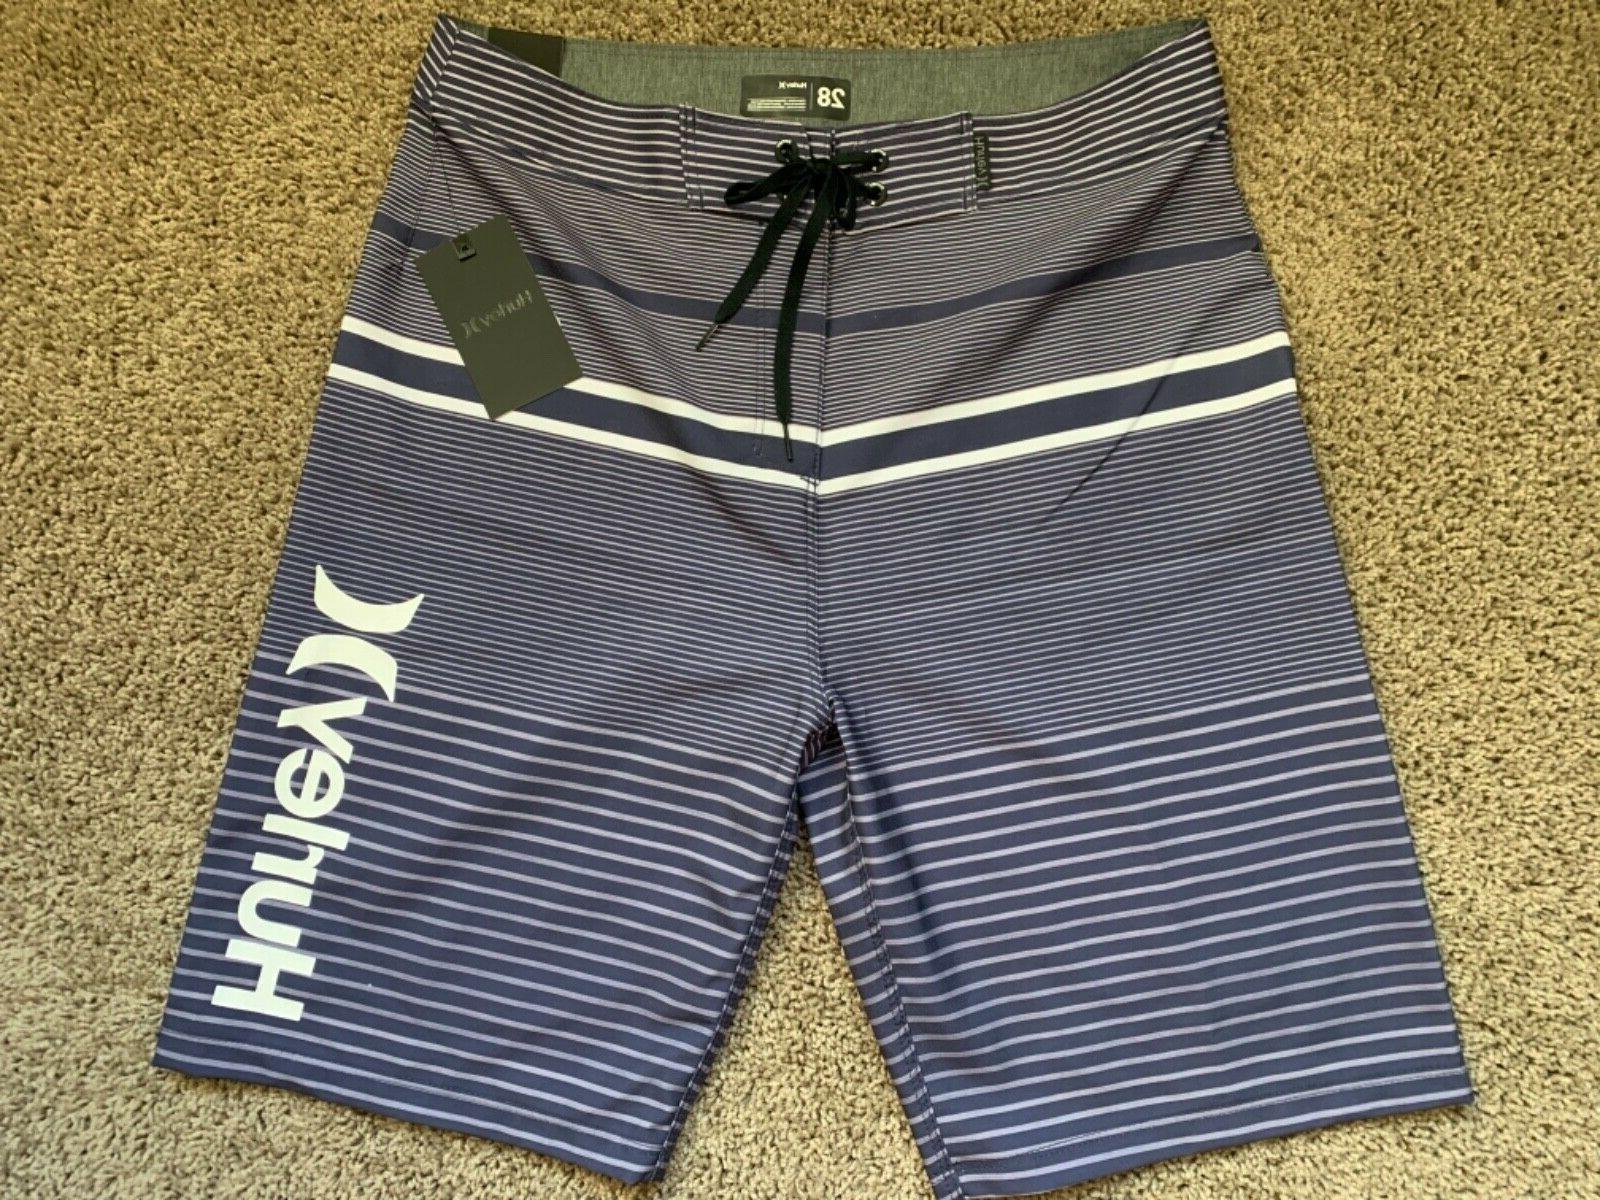 brand new mens board shorts wailer 28